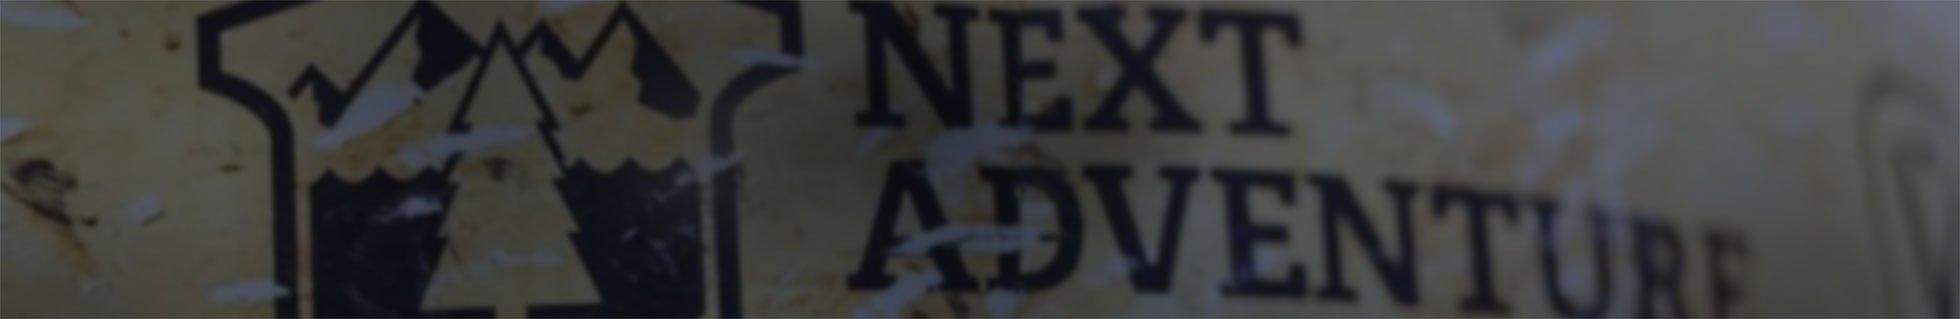 MEET NEXT ADVENTURE